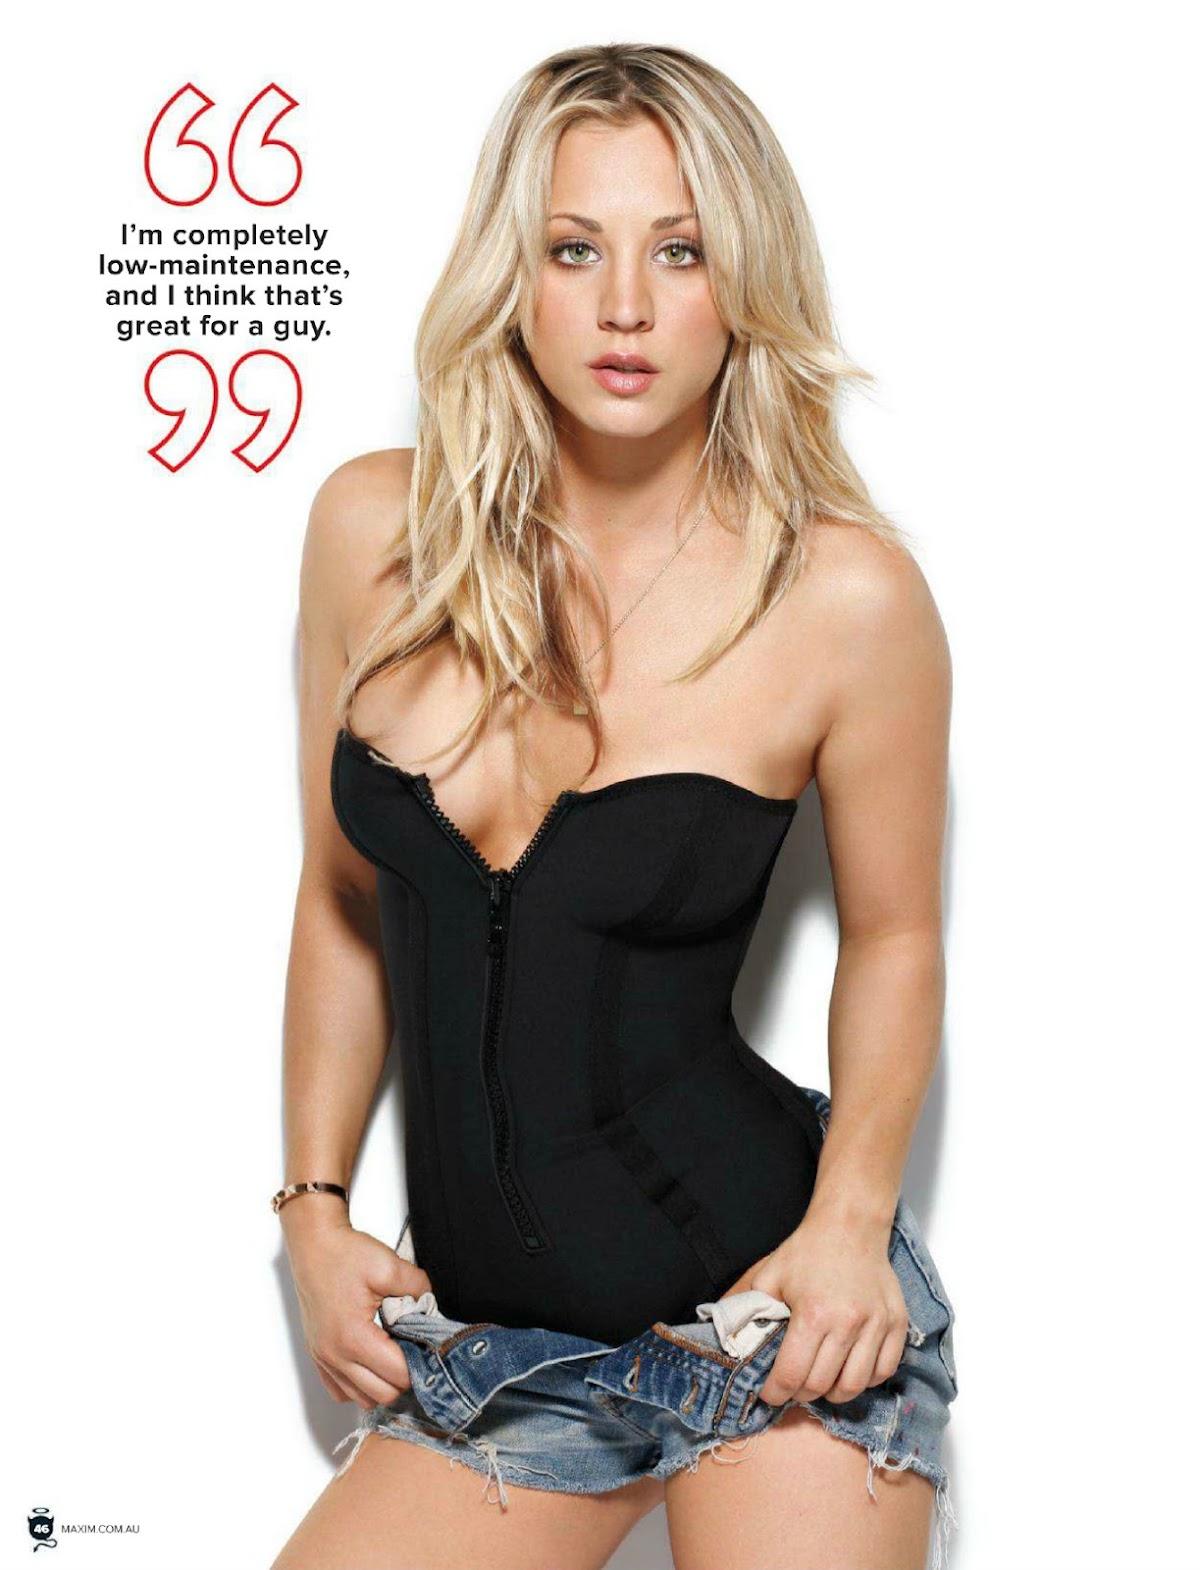 http://2.bp.blogspot.com/-TZqgrosueBc/T-cXPqmFbEI/AAAAAAAAFG4/8PryF5hkPBE/s1570/Kaley+Cuoco+-+Maxim+magazine+Australia+July+2012+11.jpg